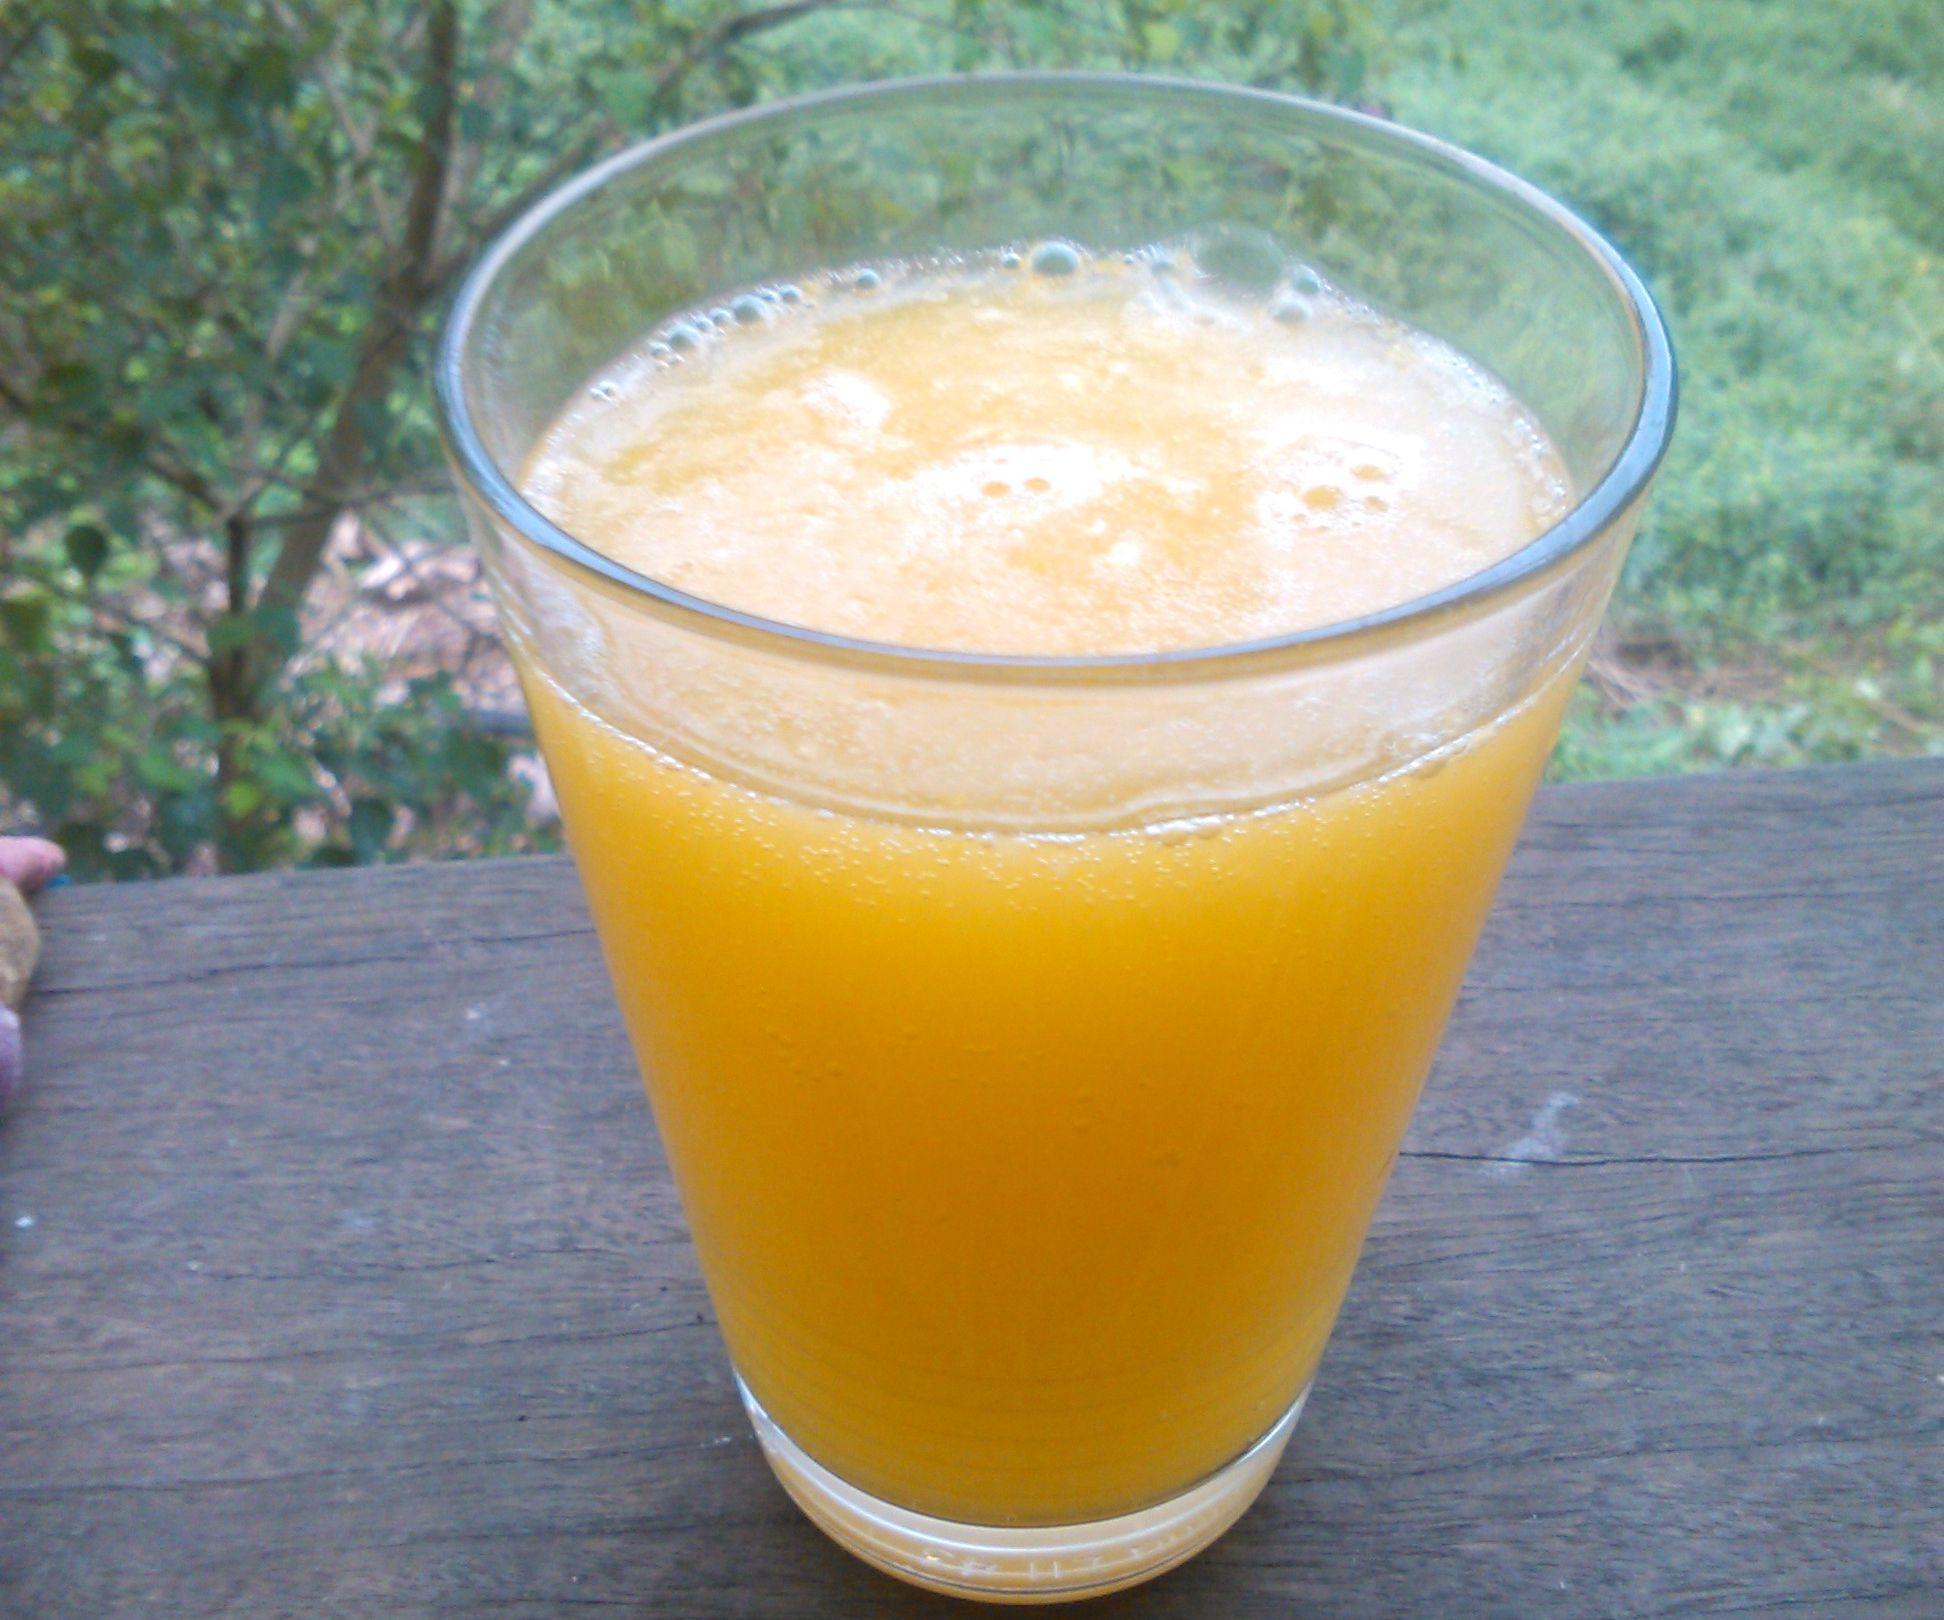 Easy Homemade Soda (Soft drink)